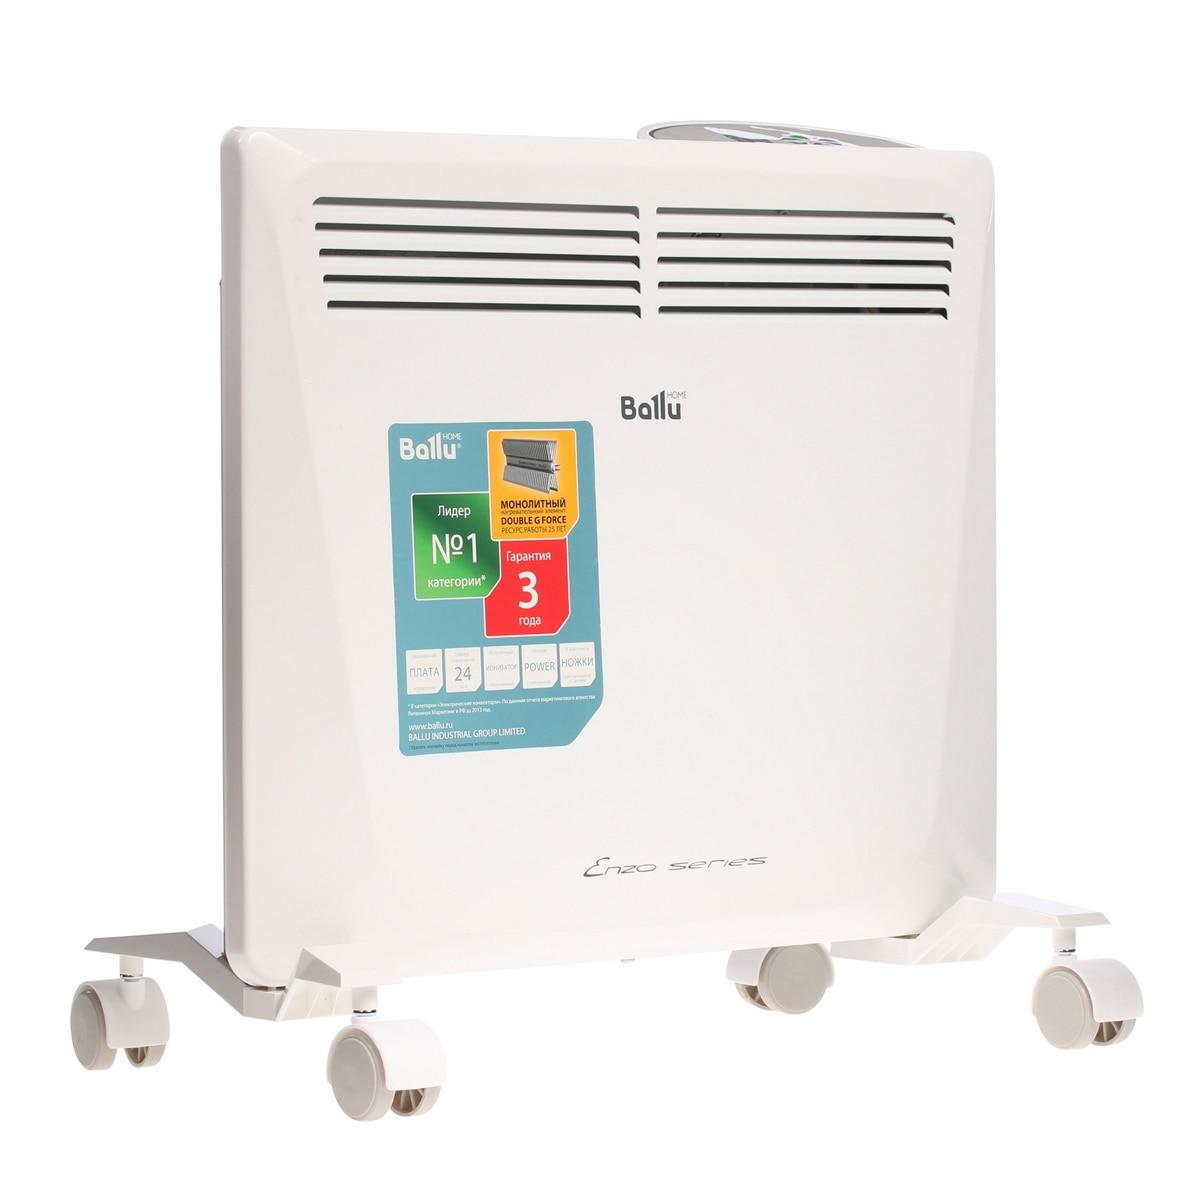 Convection heater Ballu BEC/EZER-1500 engine heater